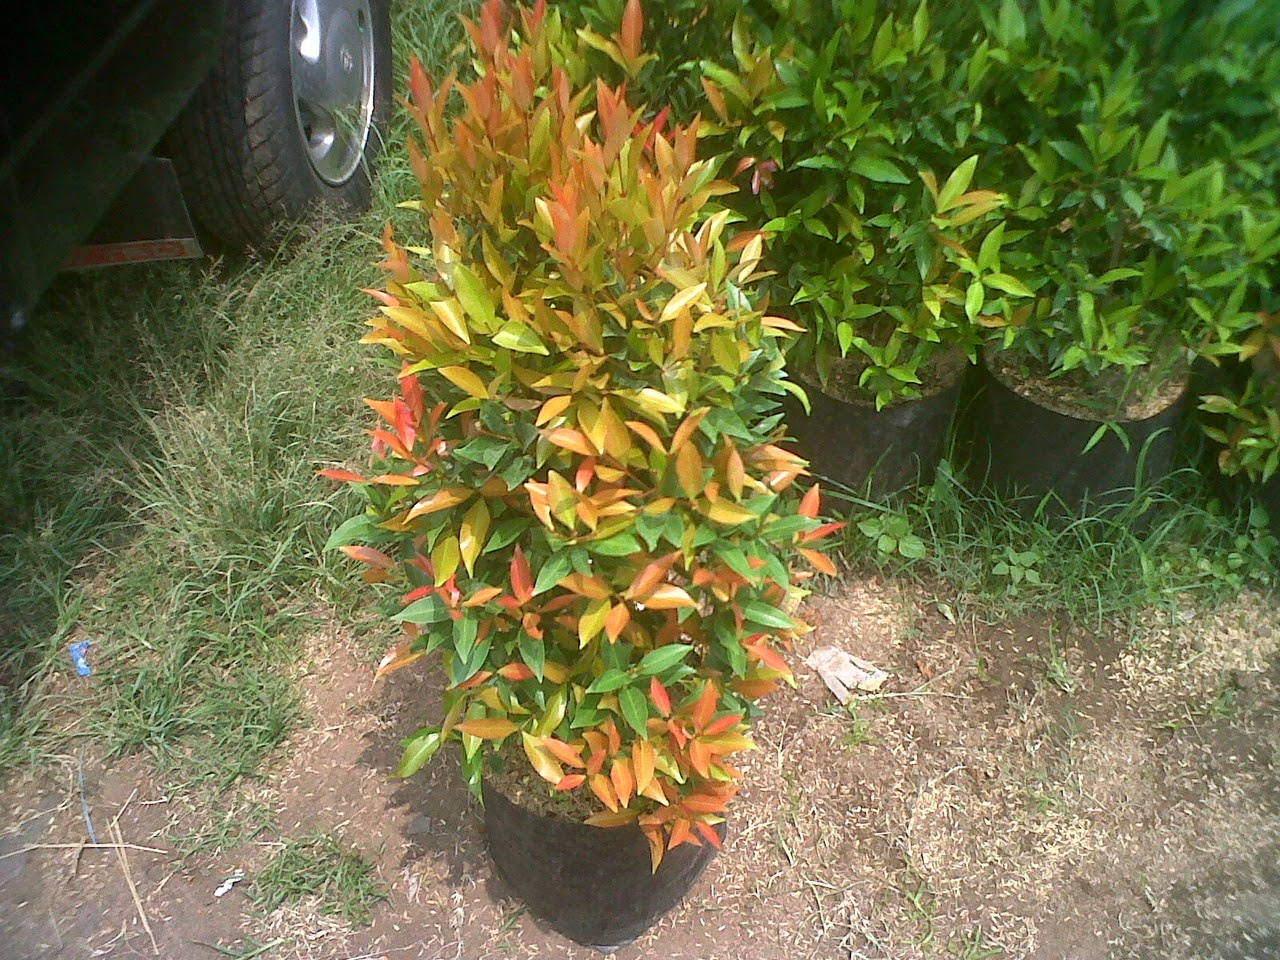 pohon-pucuk-merah-tanaman-hias.jpg